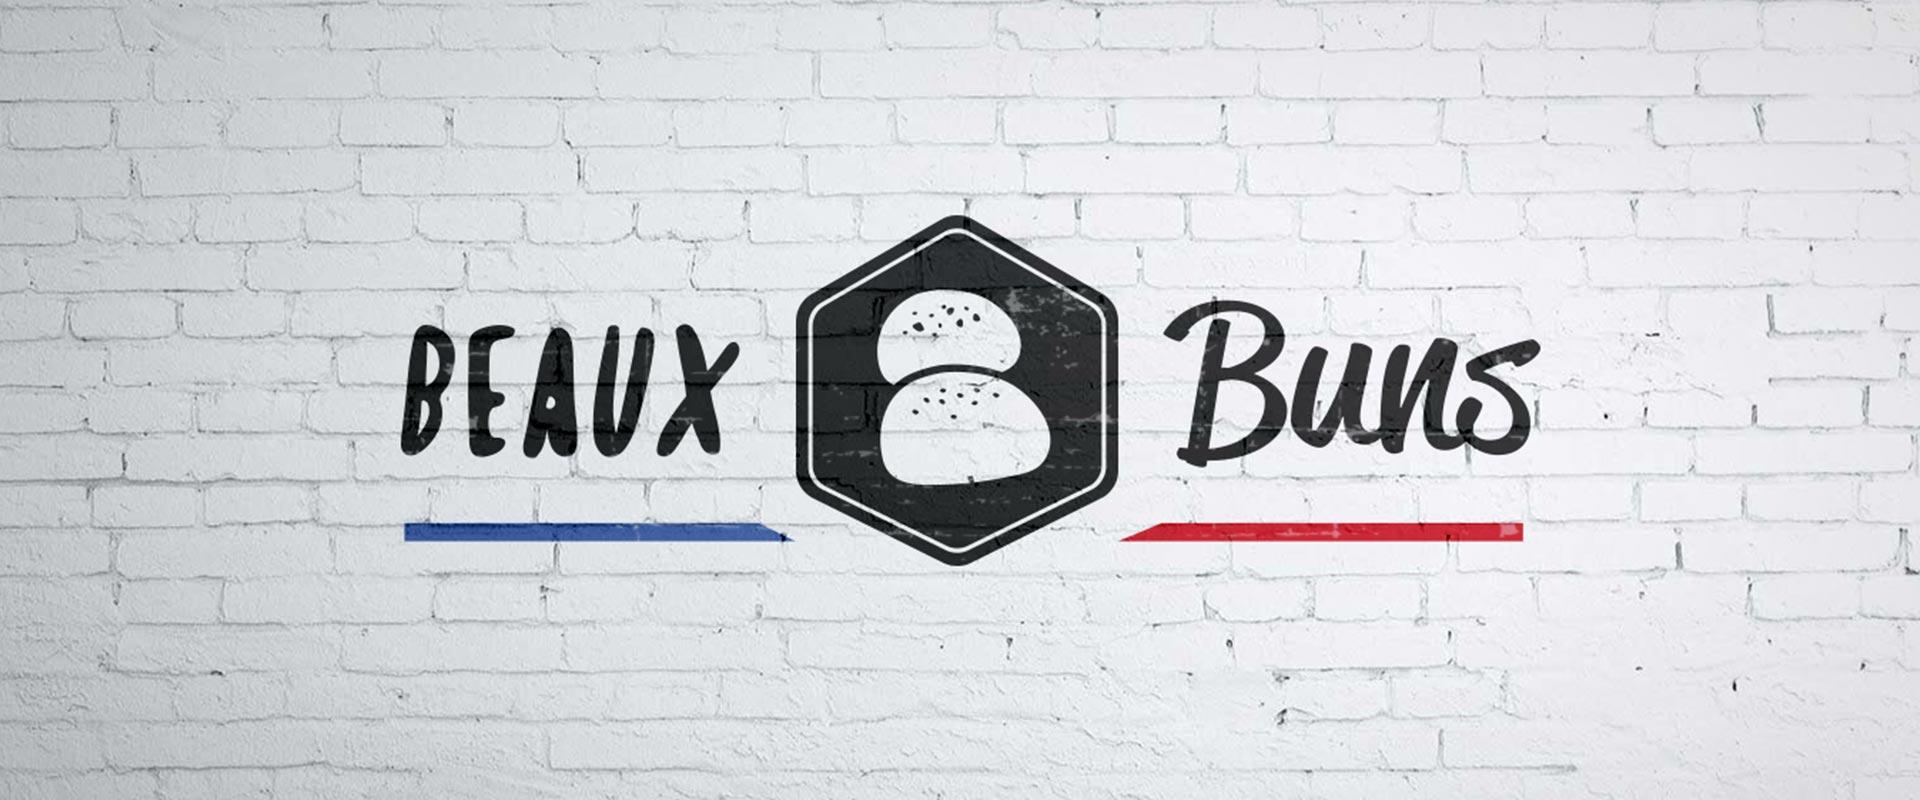 beaux-buns-lemans.jpg